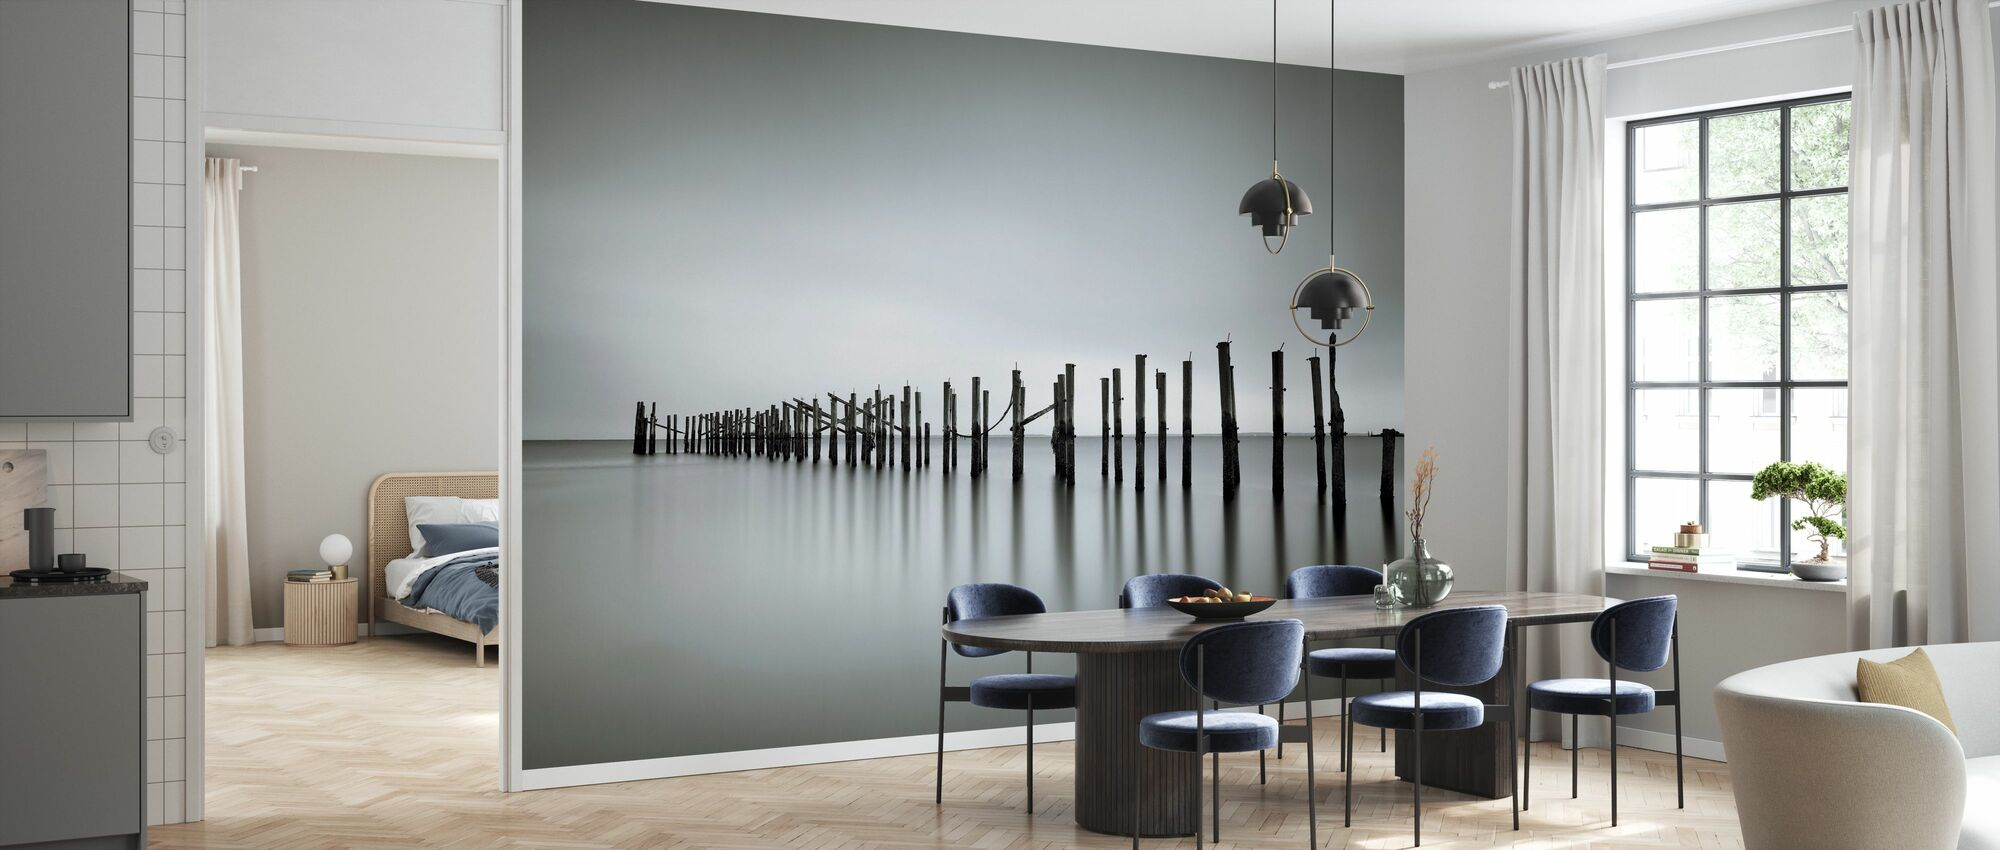 Still - Wallpaper - Kitchen